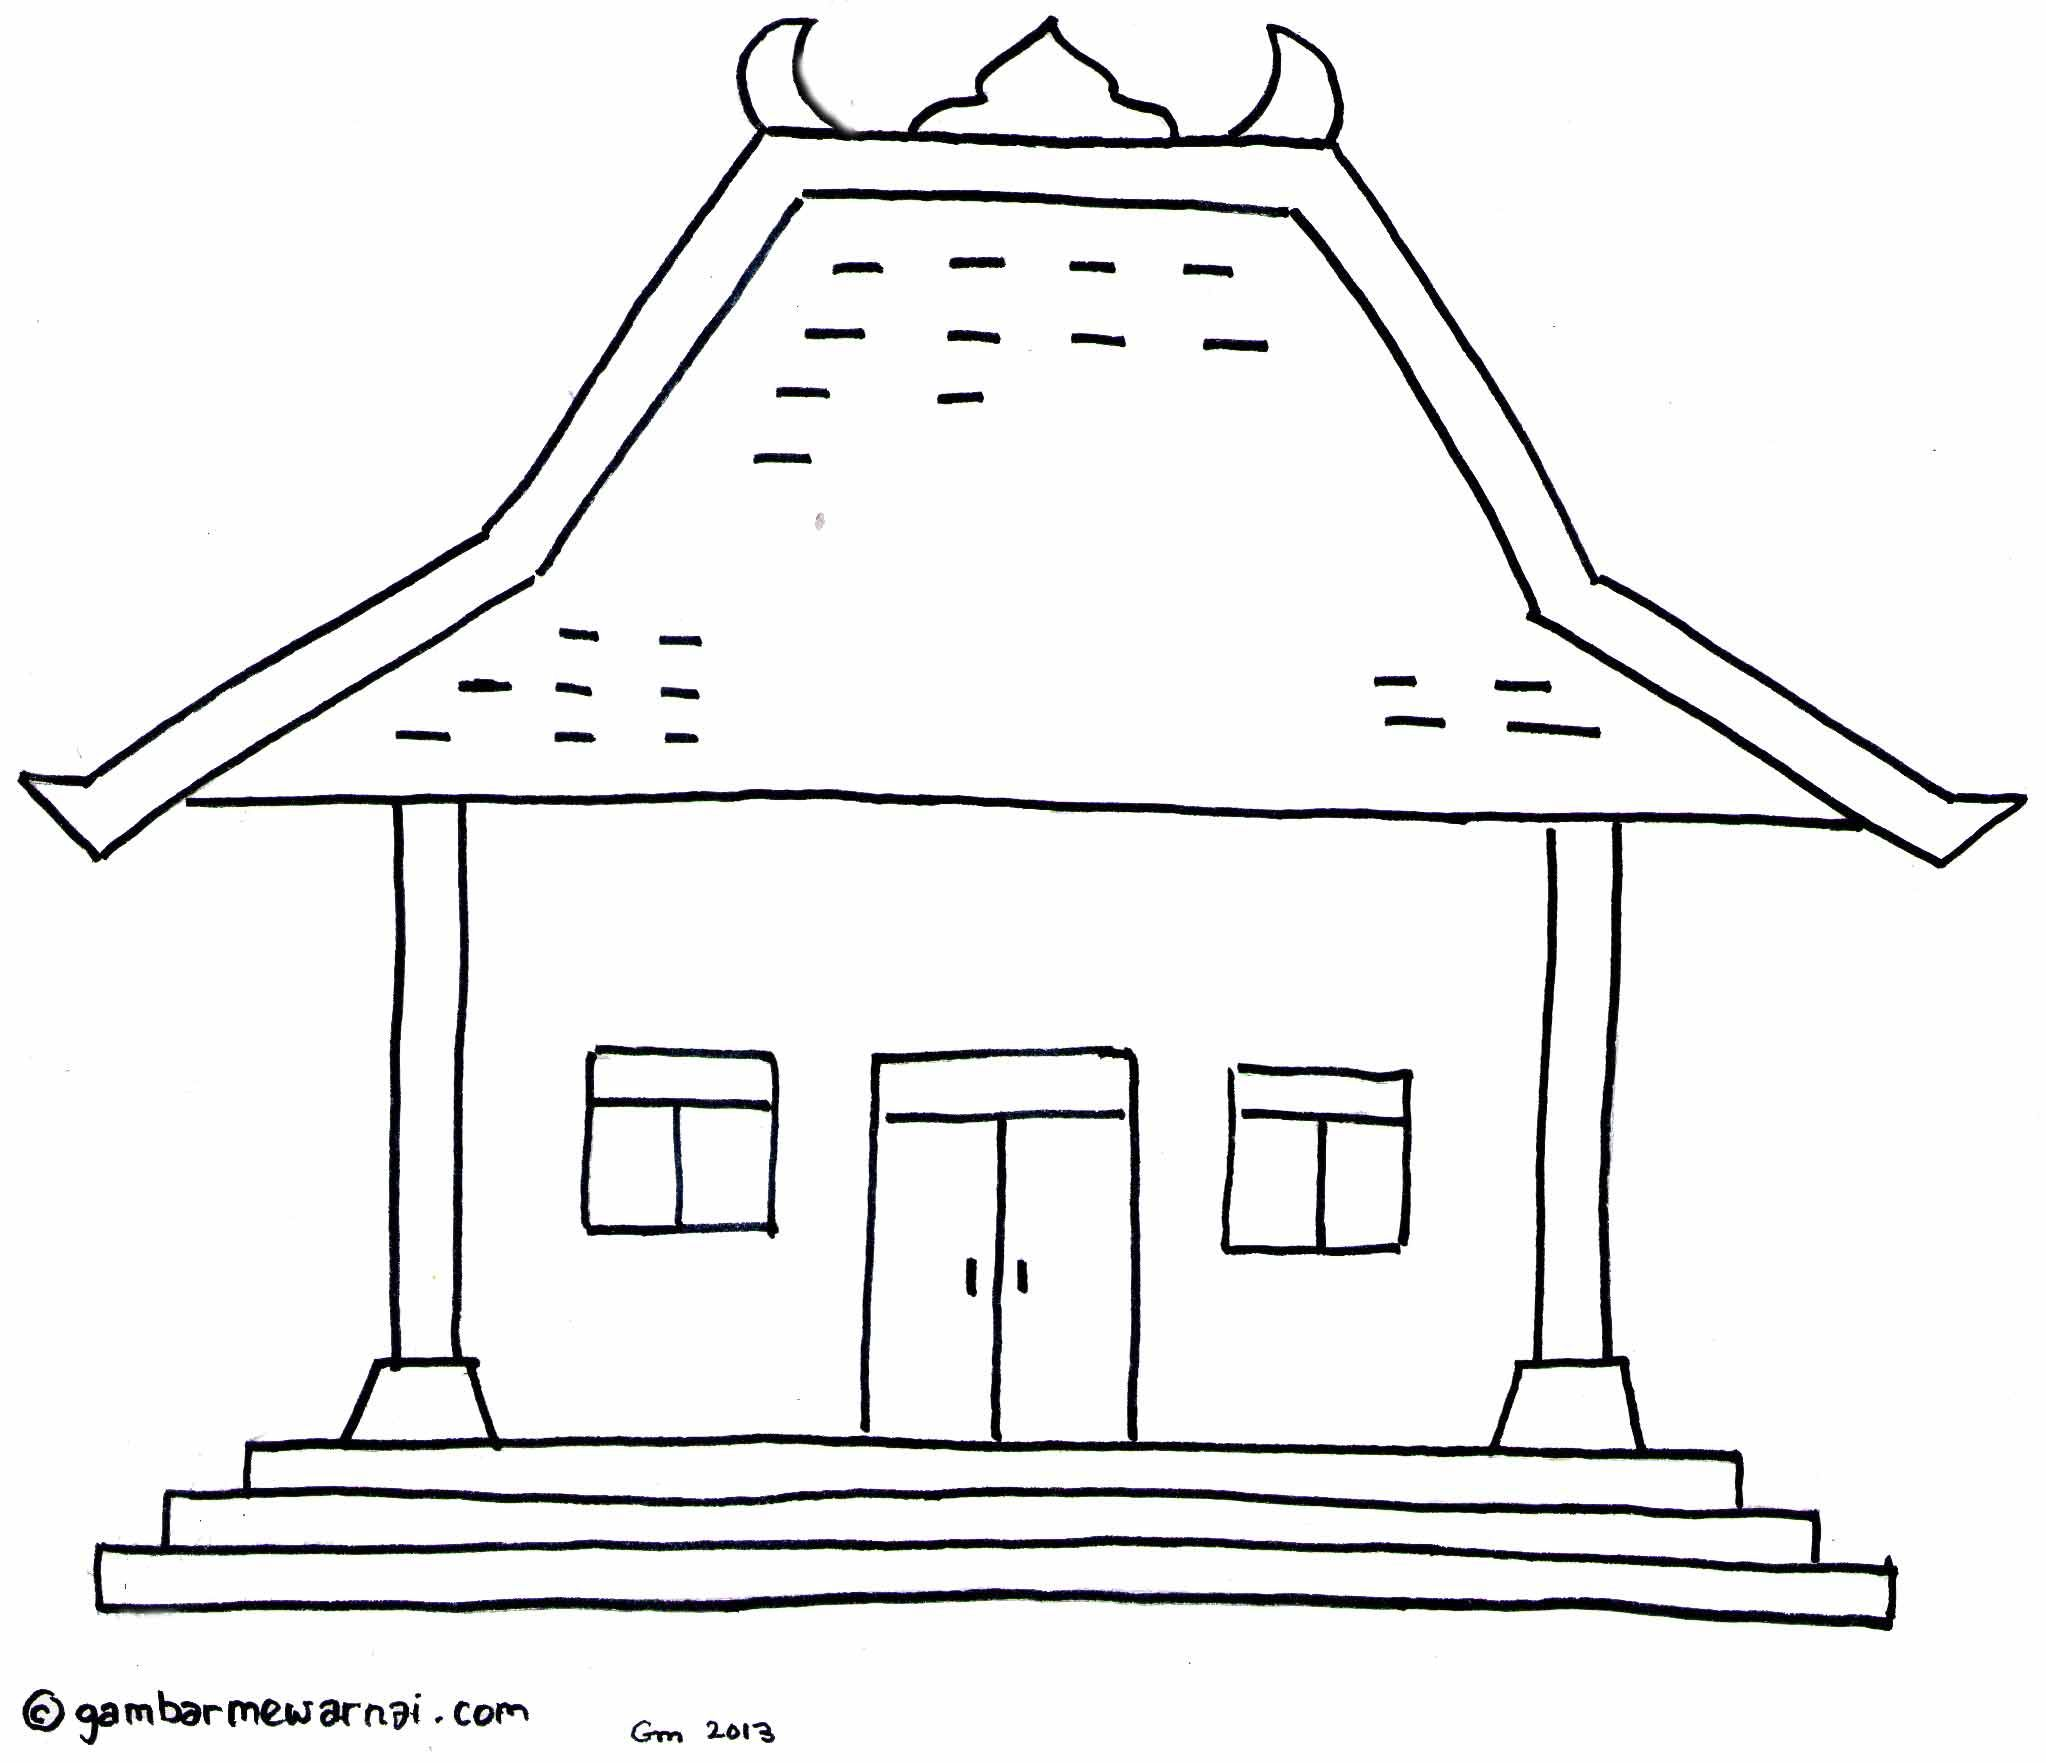 25 Sketsa Gambar Rumah Adat Bolon Terlengkap Koleksi